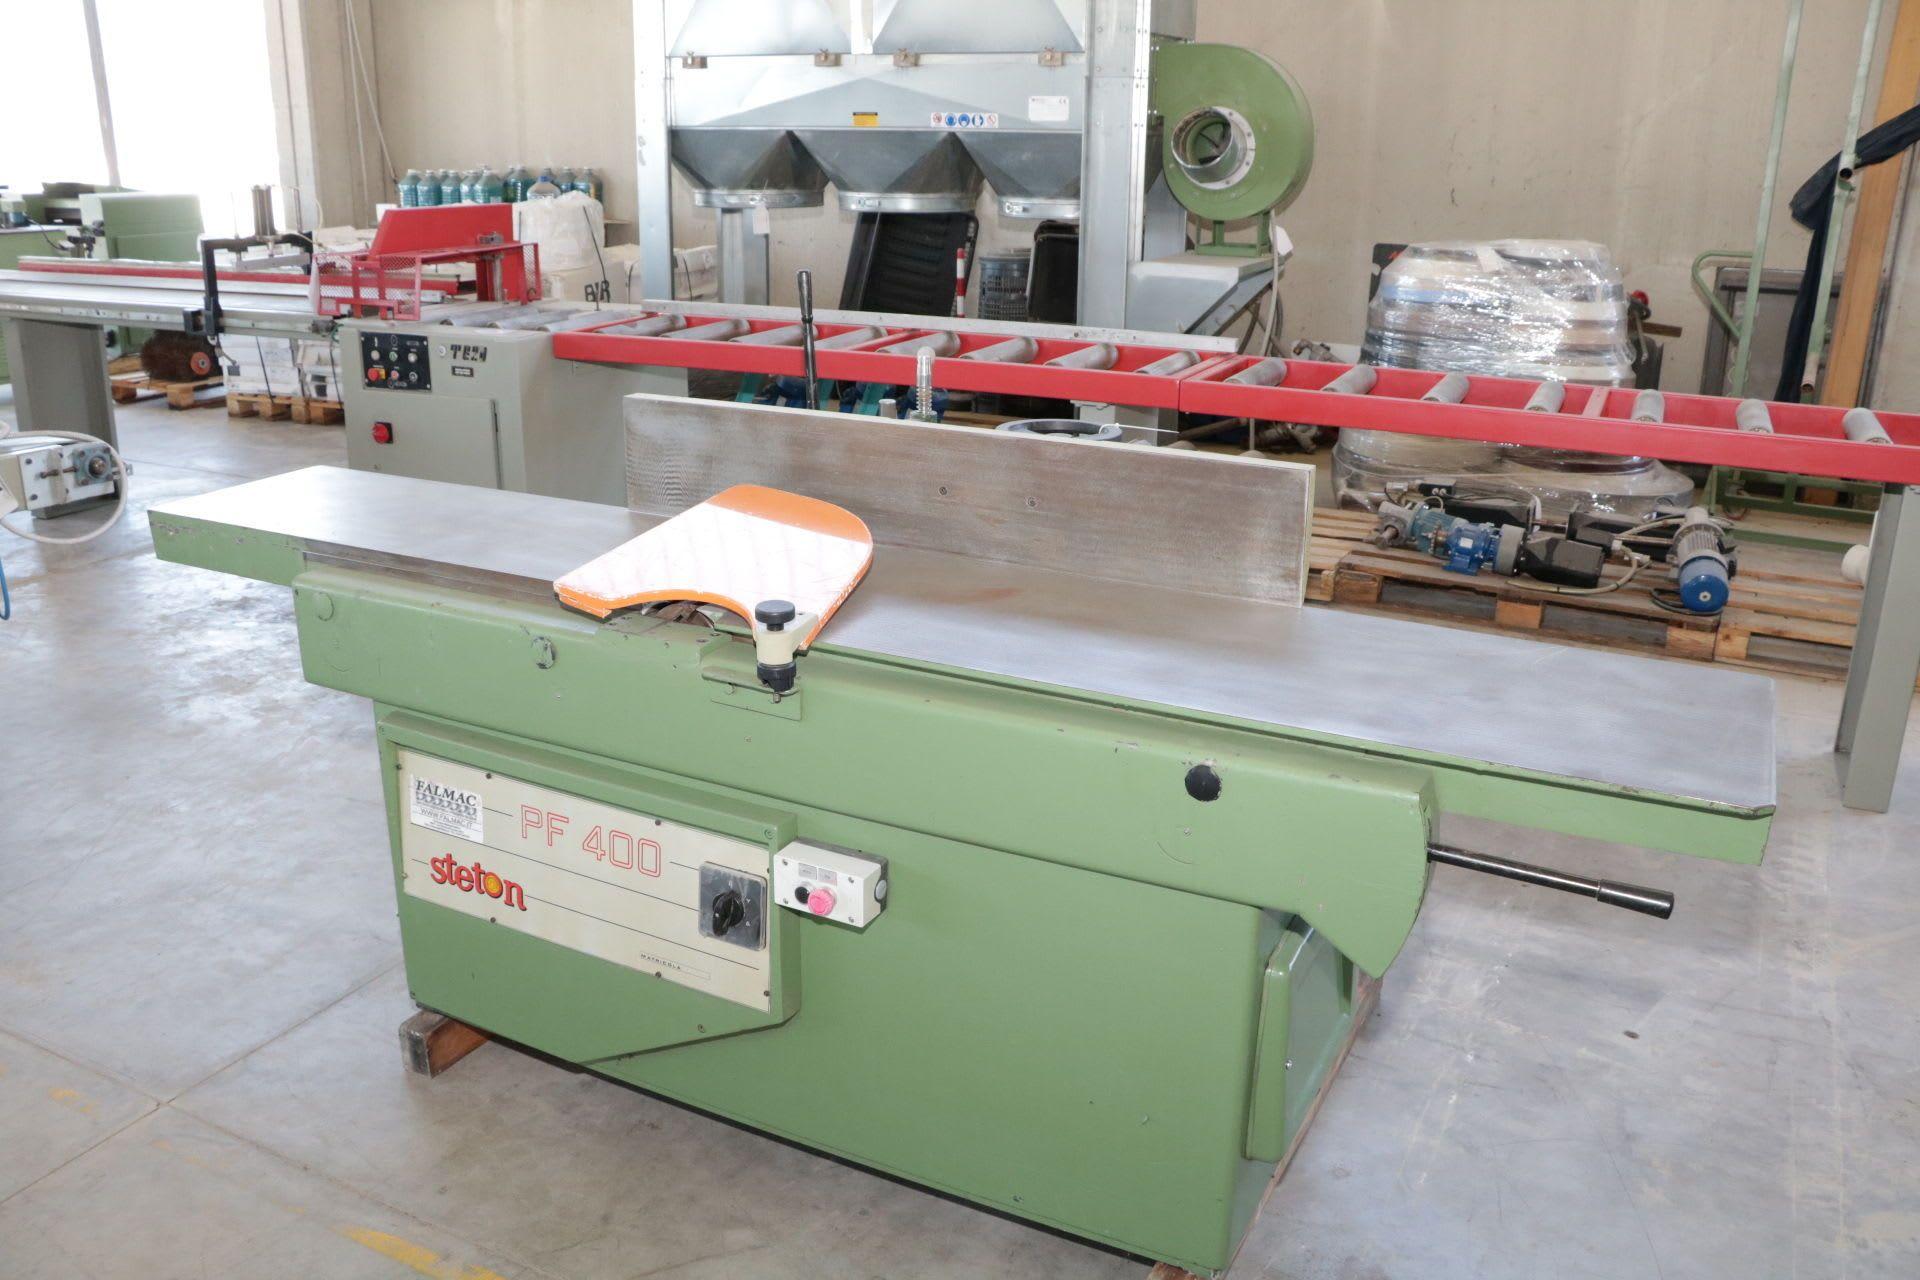 STETON PF 400 Kombinierte Maschine/Abrichthobel/Kettenstemmer